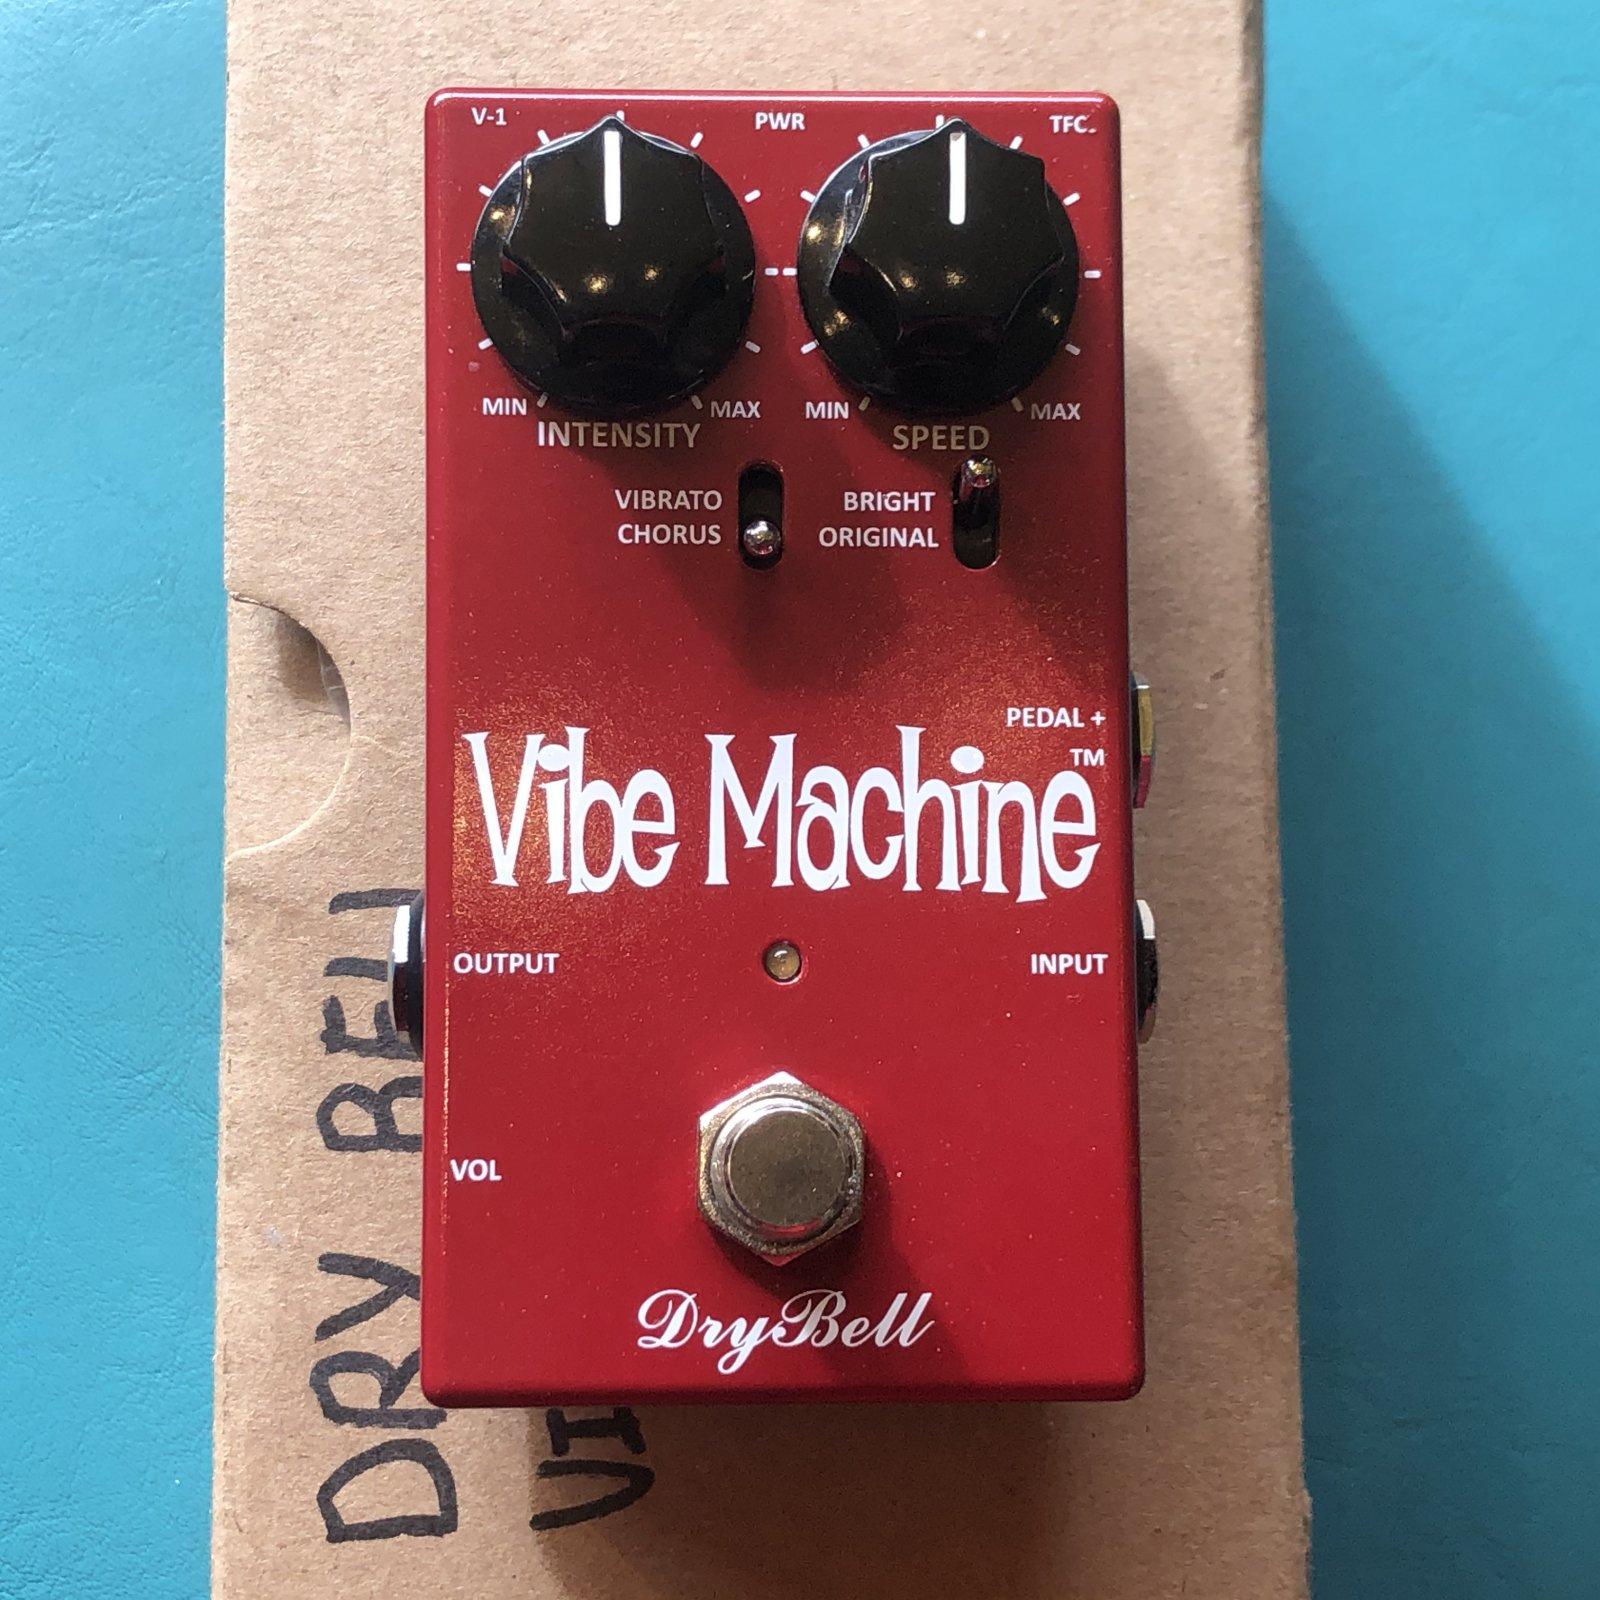 Drybell Vibe Machine Chorus Vibrato